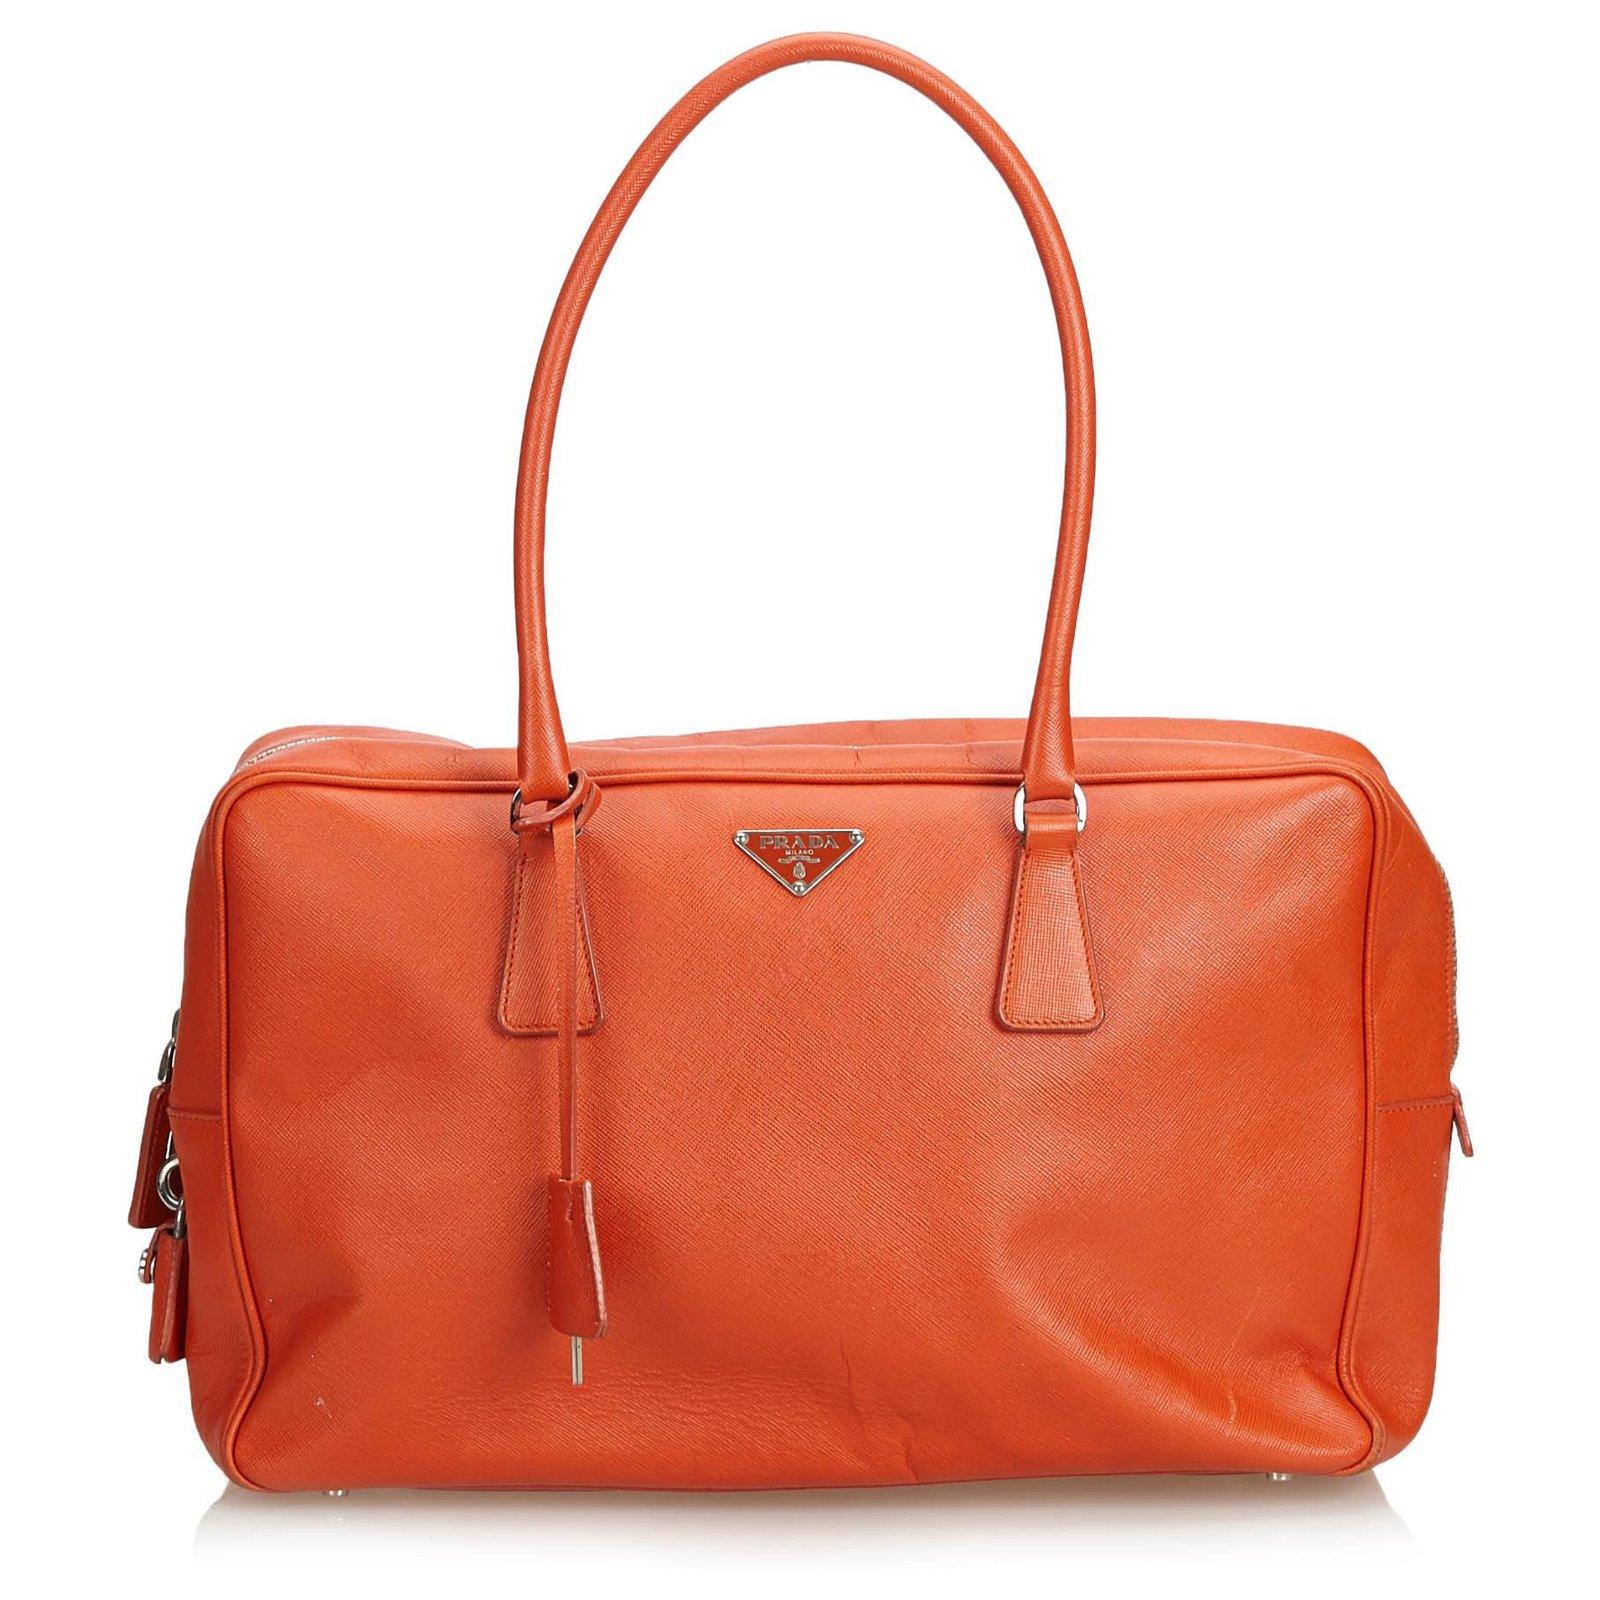 acheter populaire 24a6b 9626e Sac à main Bauletto en cuir orange saffiano Prada